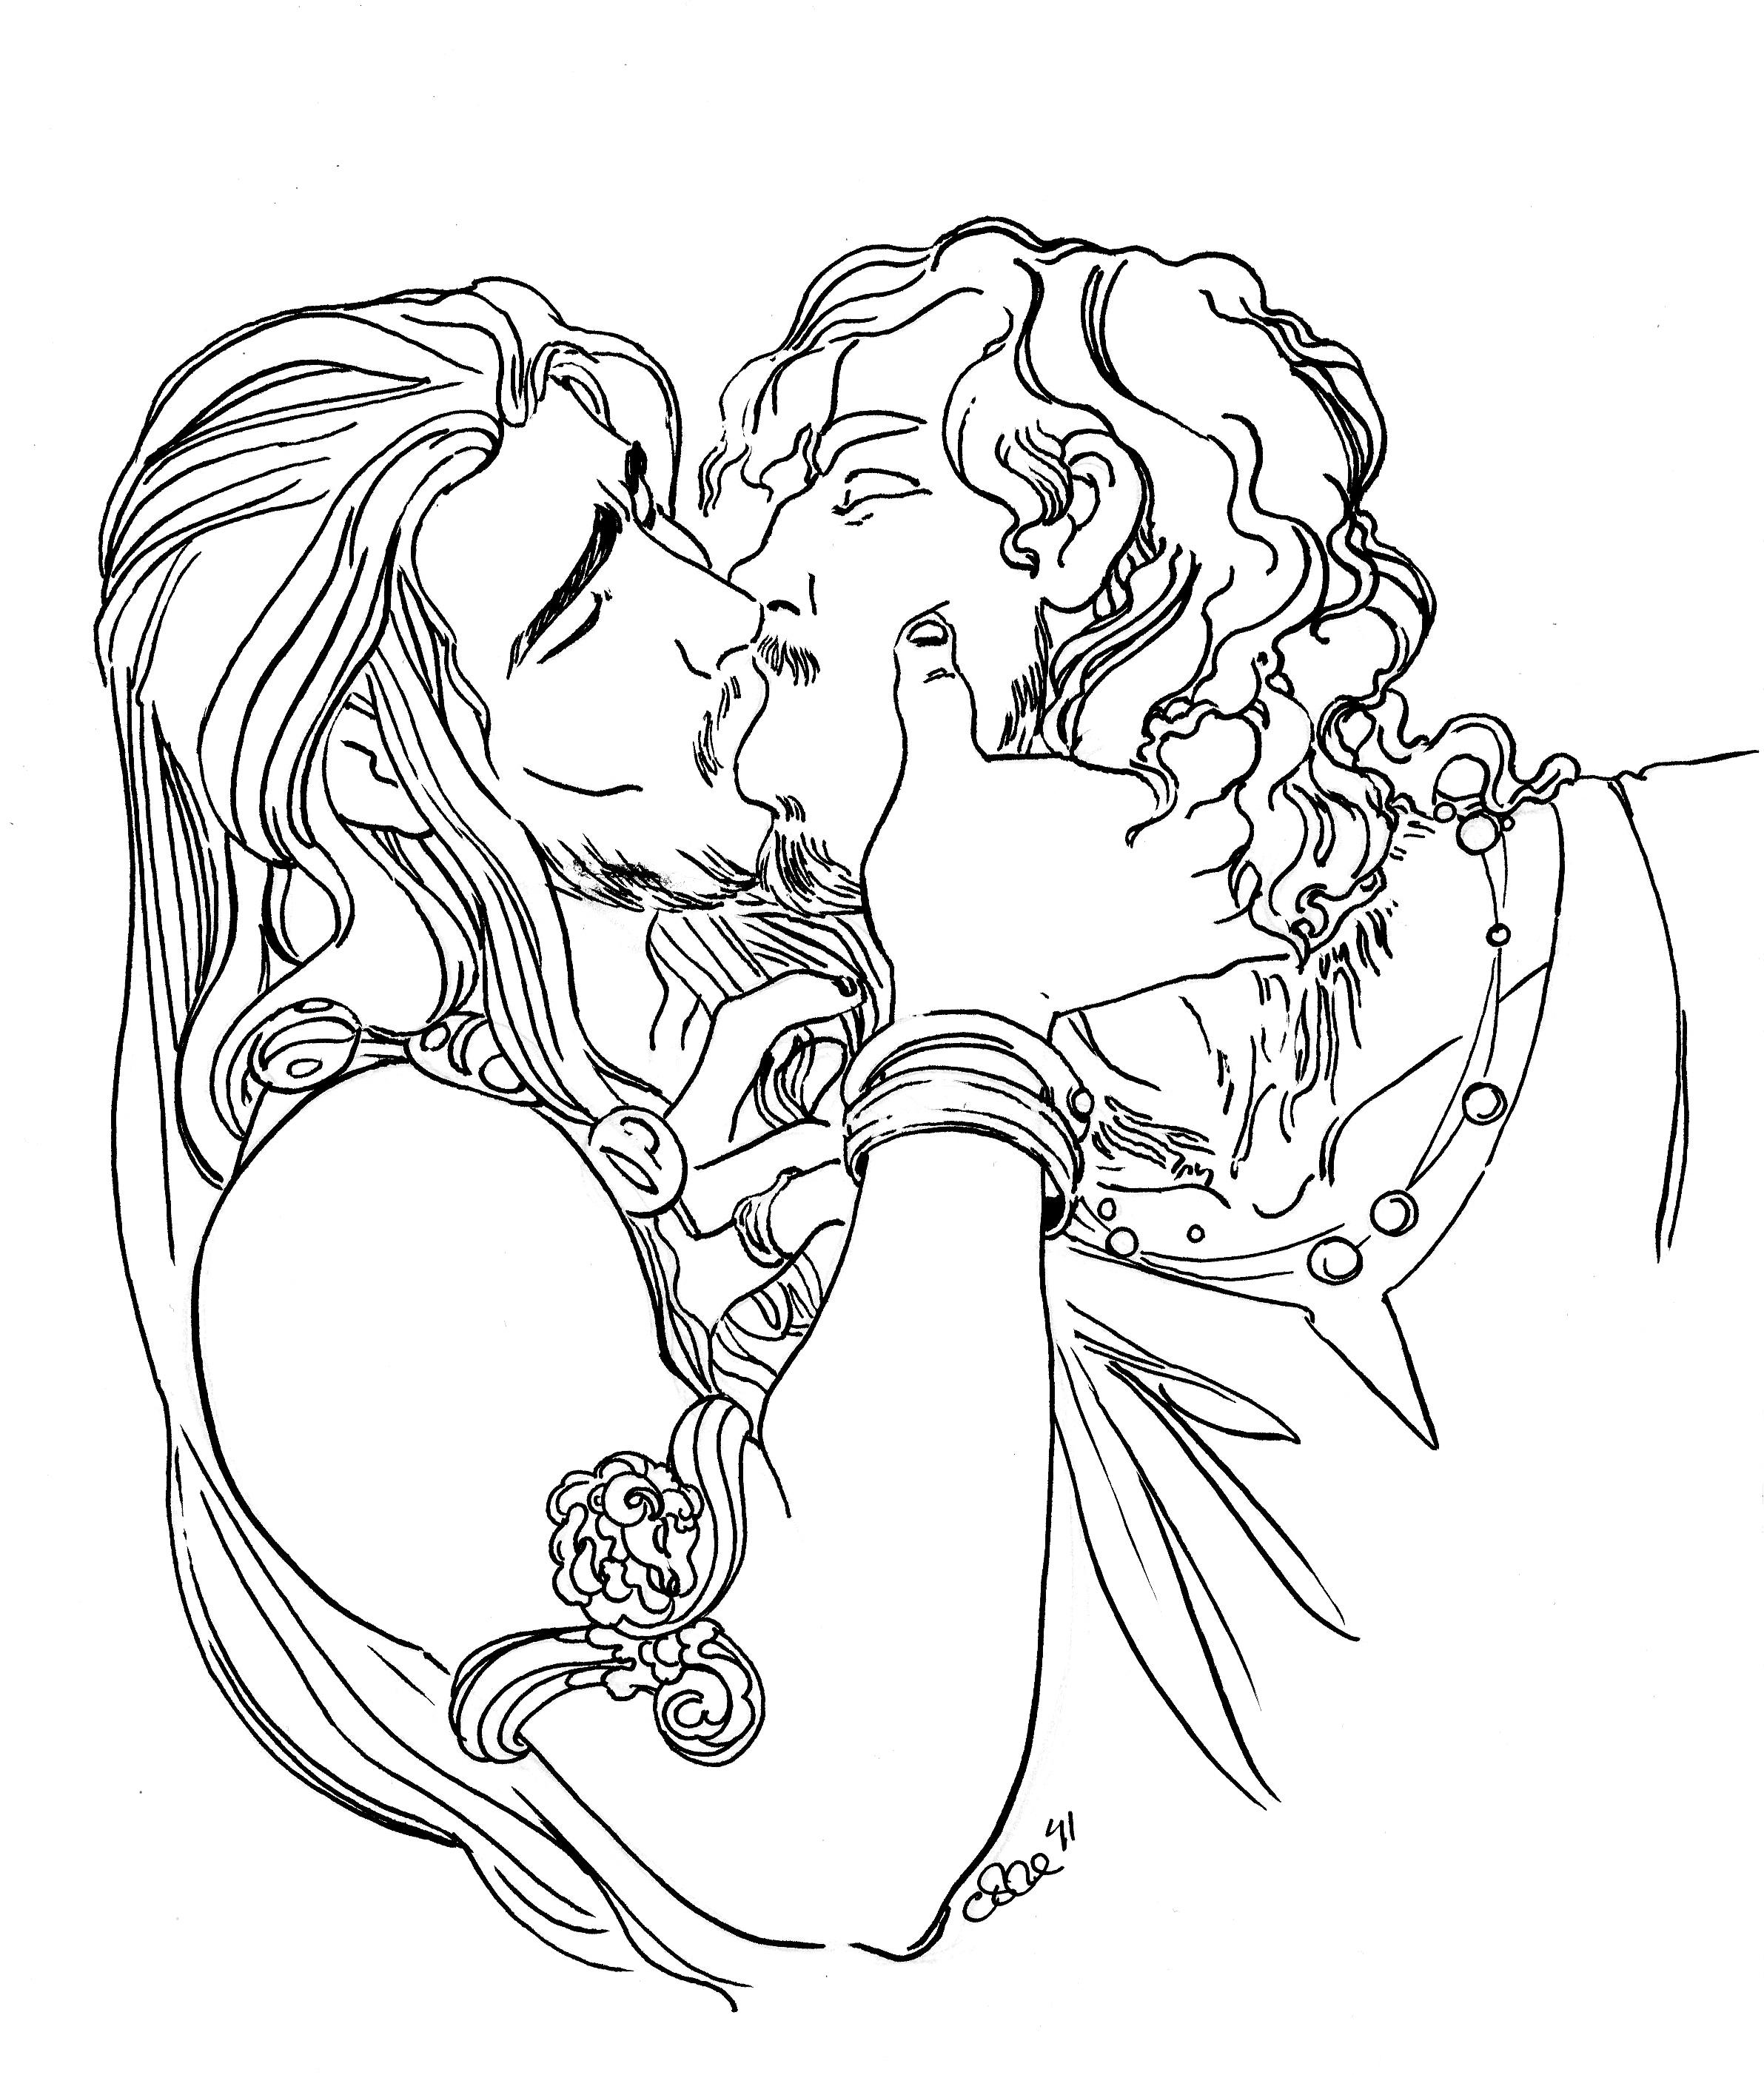 Ash and Sol Kiss B+W